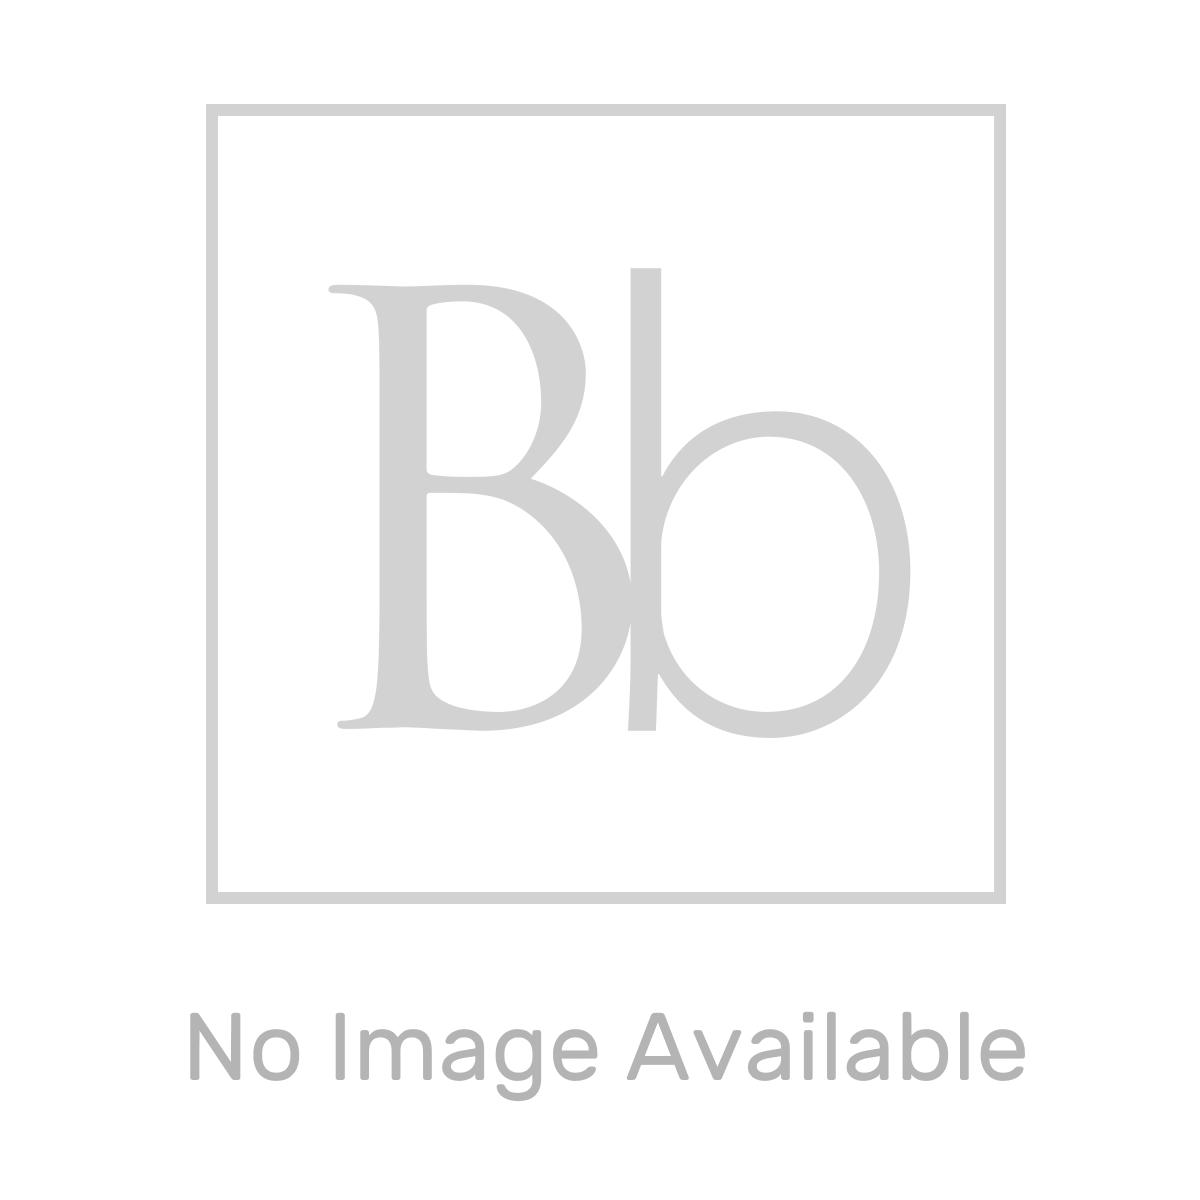 RAK Precious Carrara Wall Hung Counter Basin 1200mm with Brackets Measurements